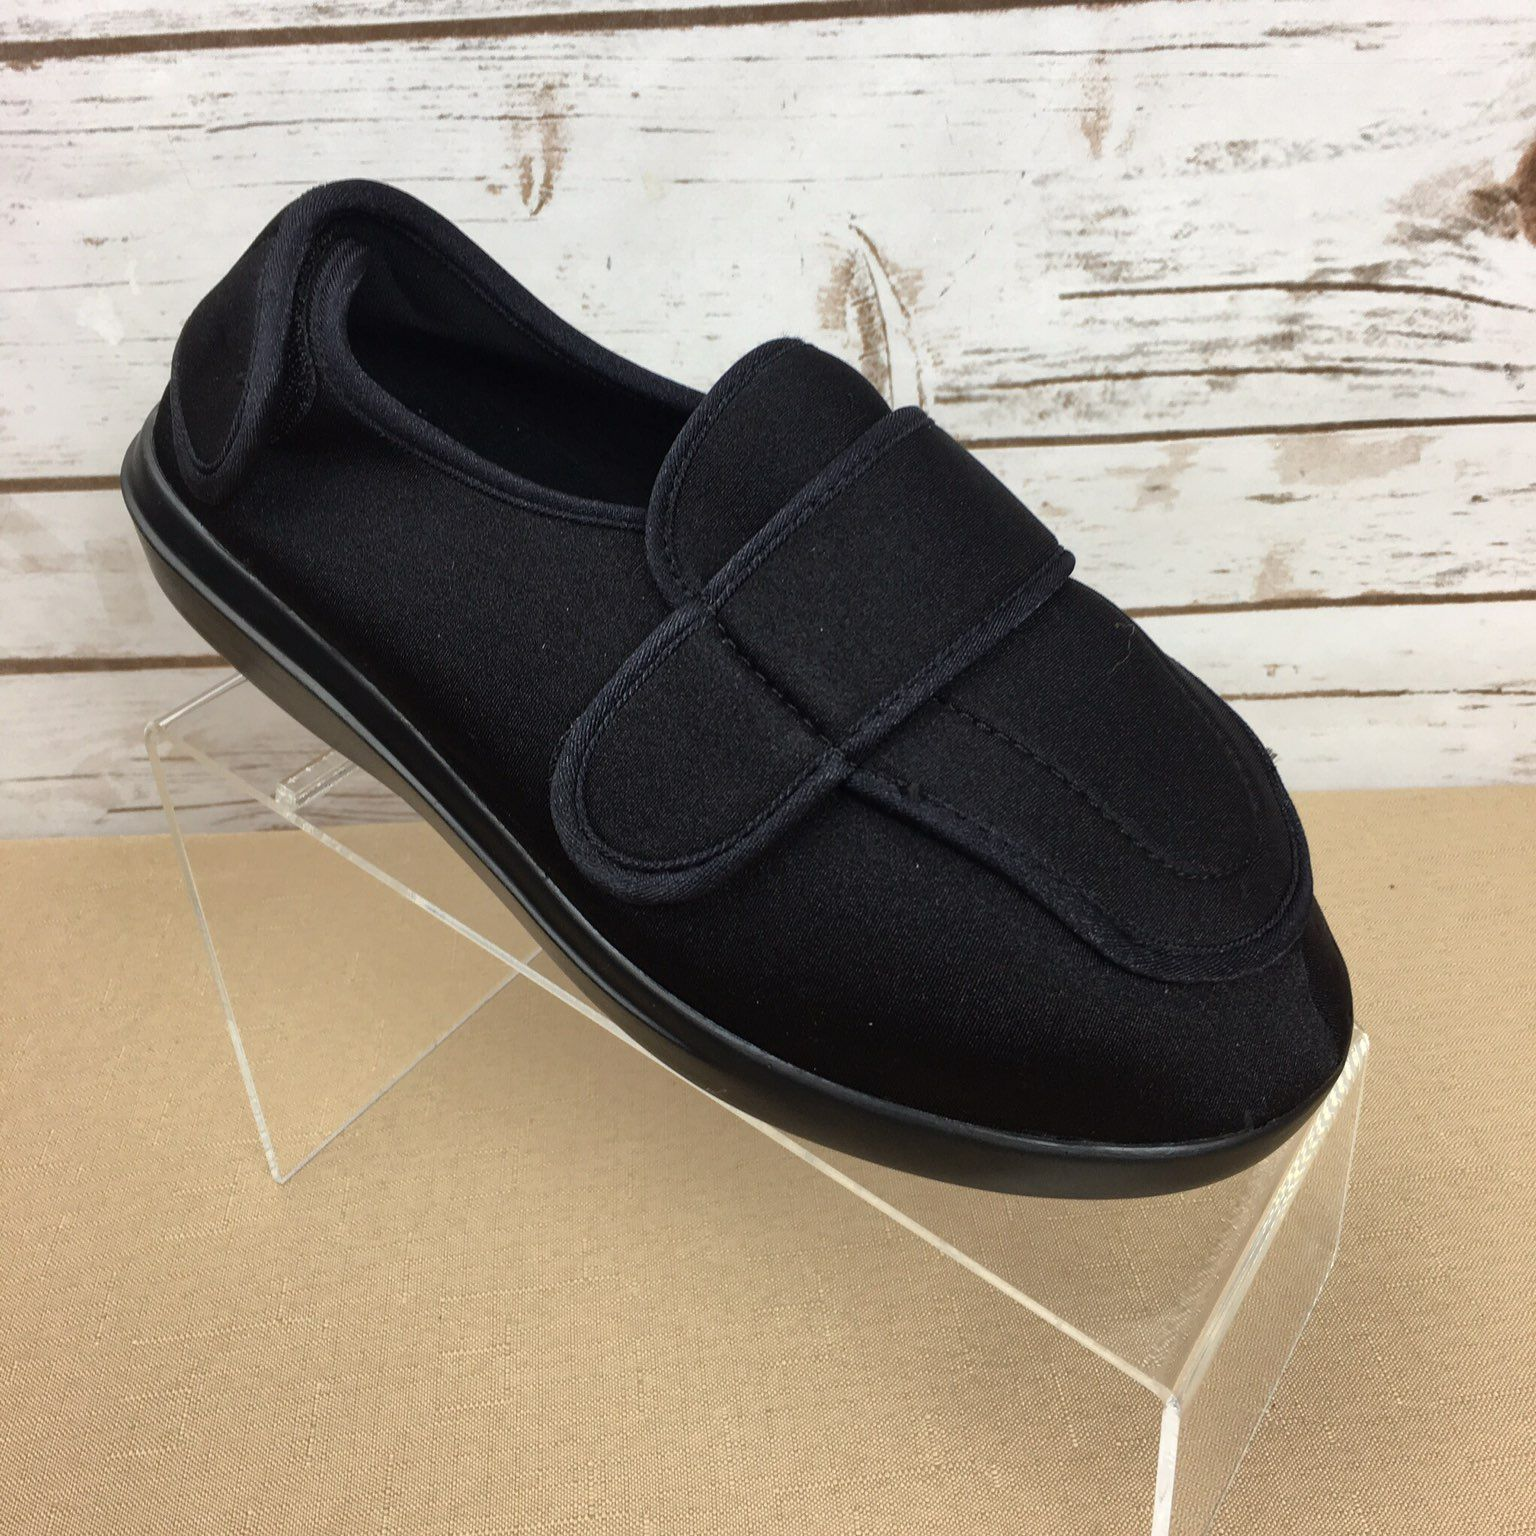 1193016cbc8 Propet Black Stretch Shoes 8.5 X(2E) - Mercari  BUY   SELL THINGS ...